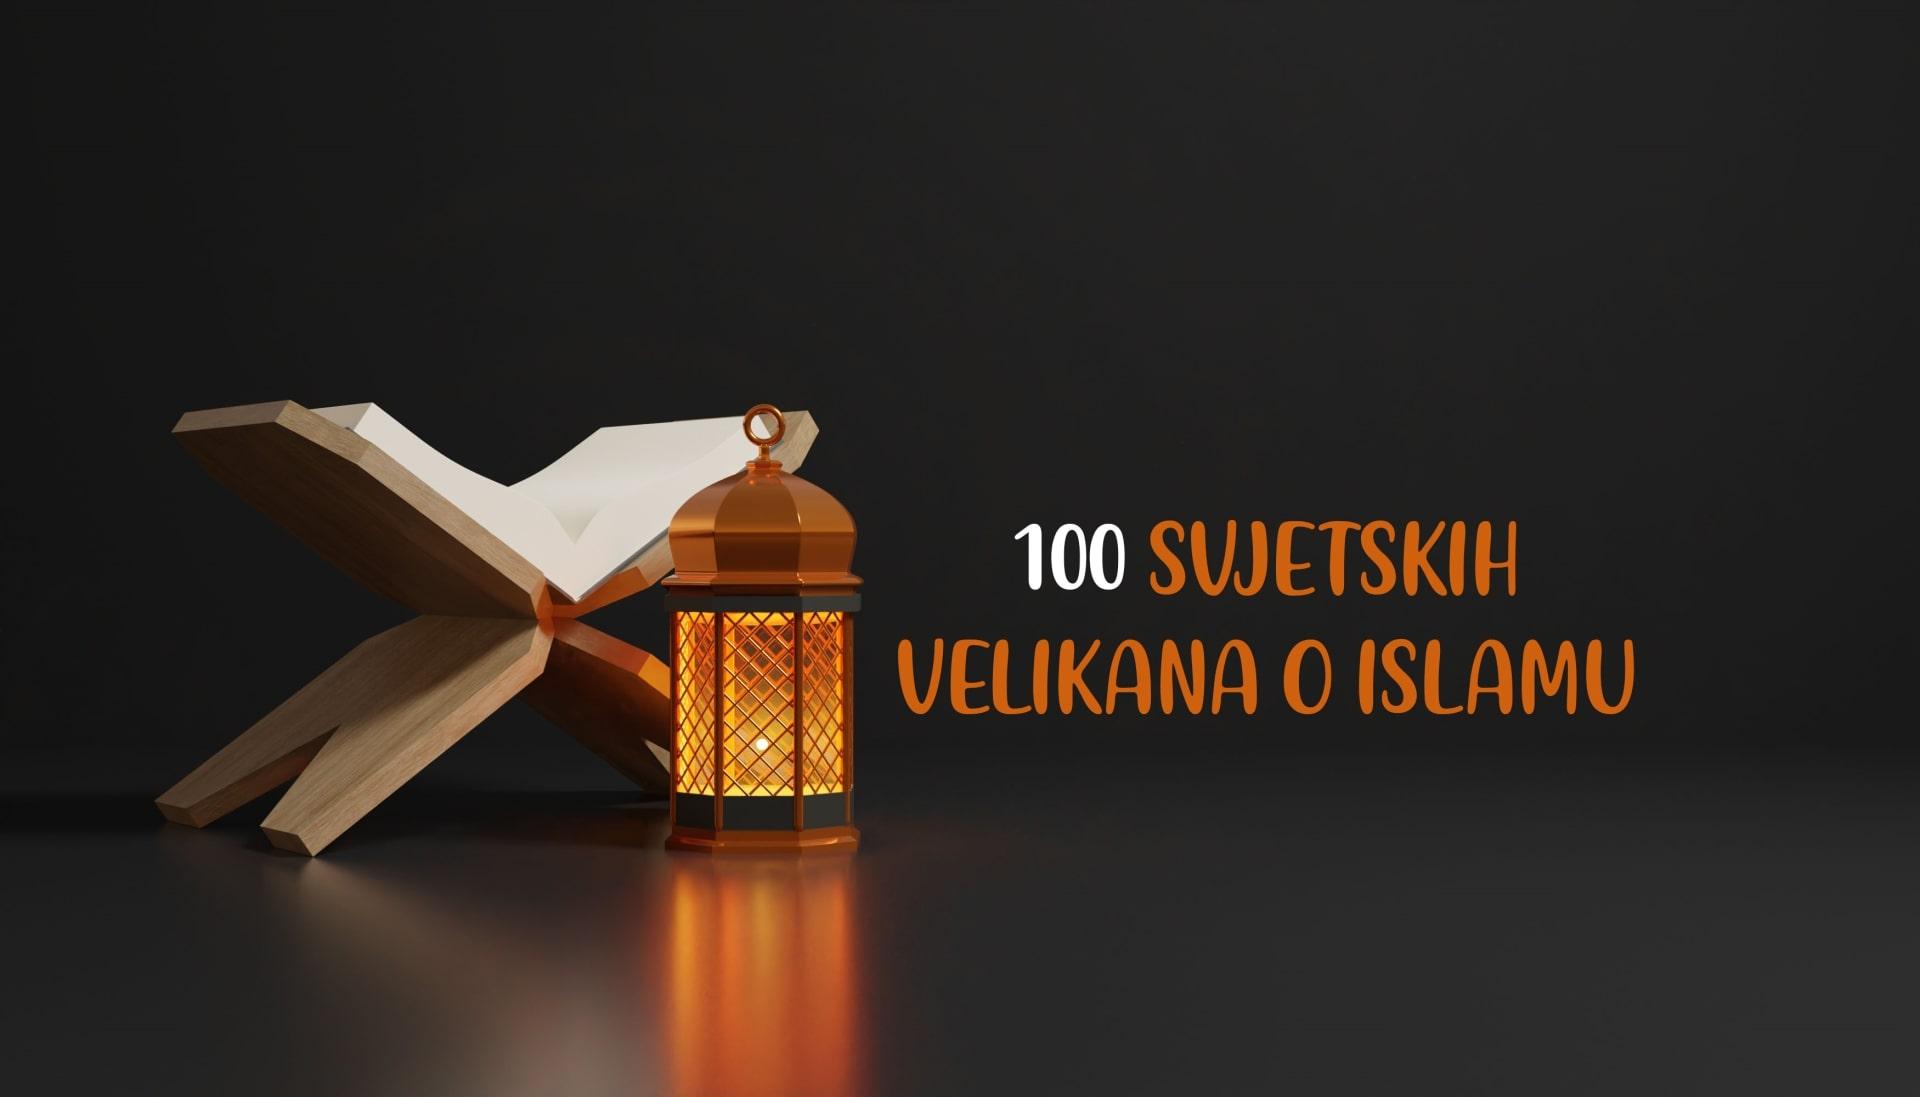 100 svjetskih velikana o islamu – Edmund Burke Poučne priče El-Kelimeh Islamska literatura Islamske knjige